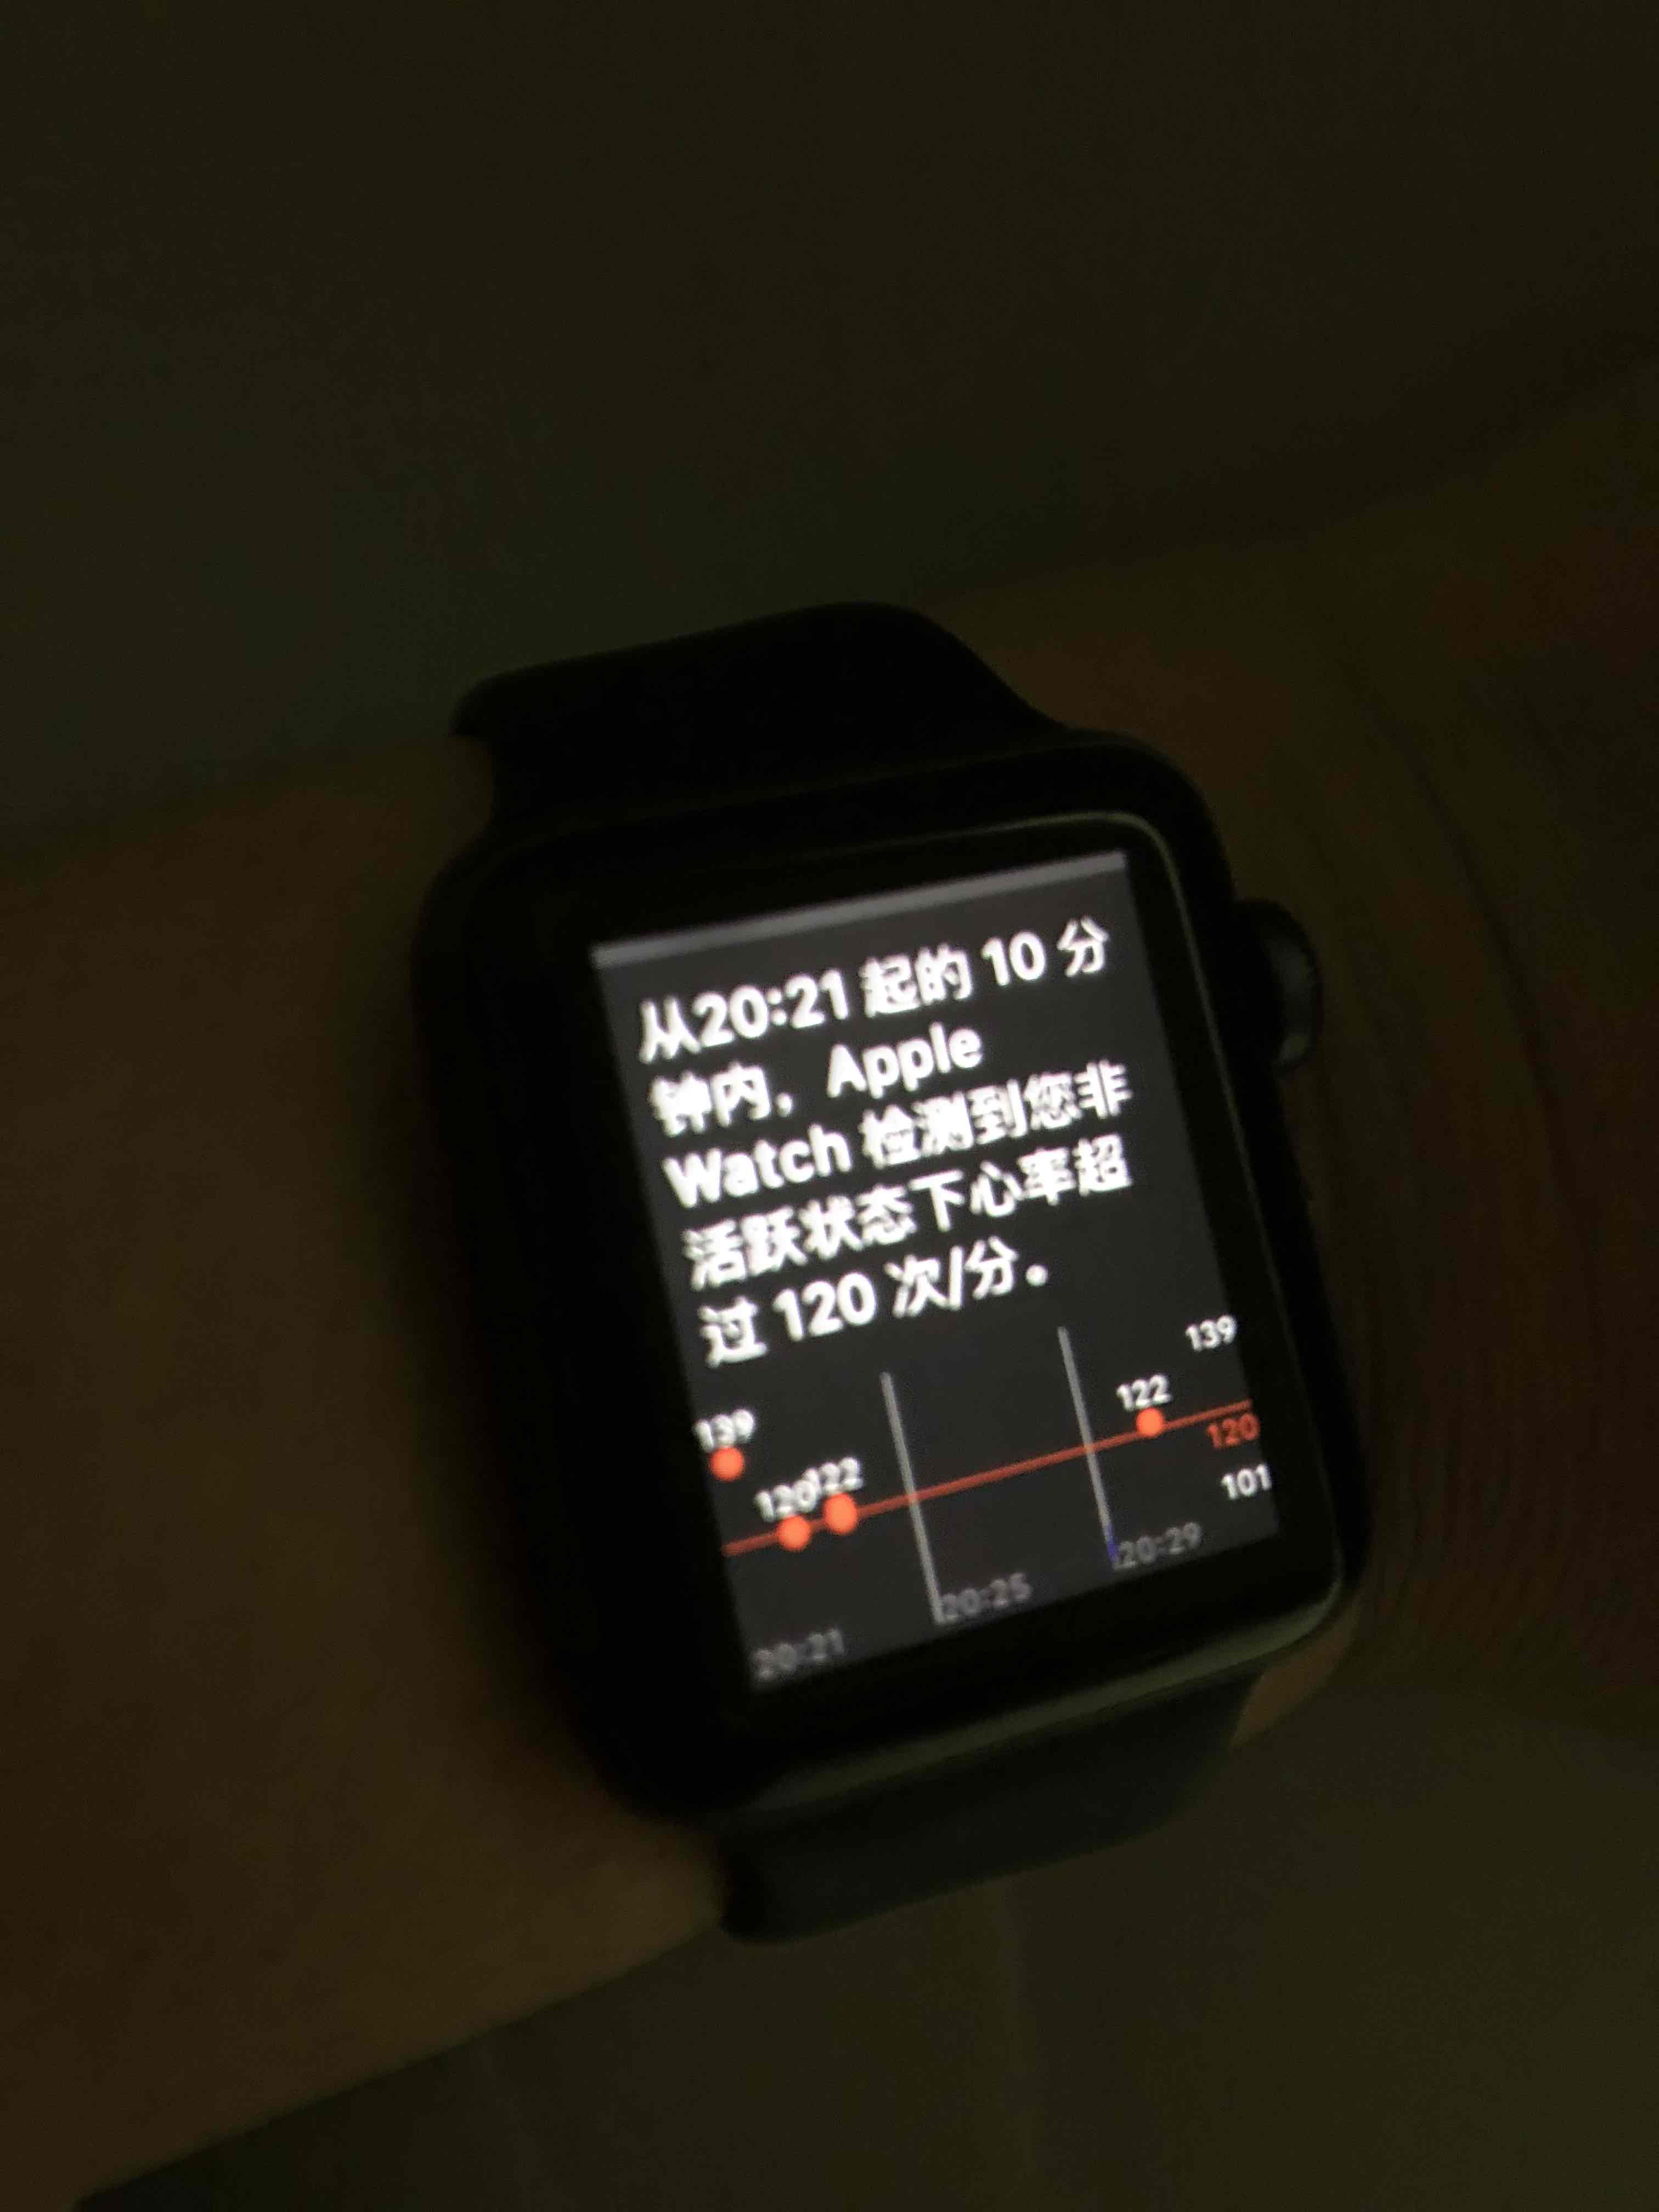 Apple Watch上的提示信息